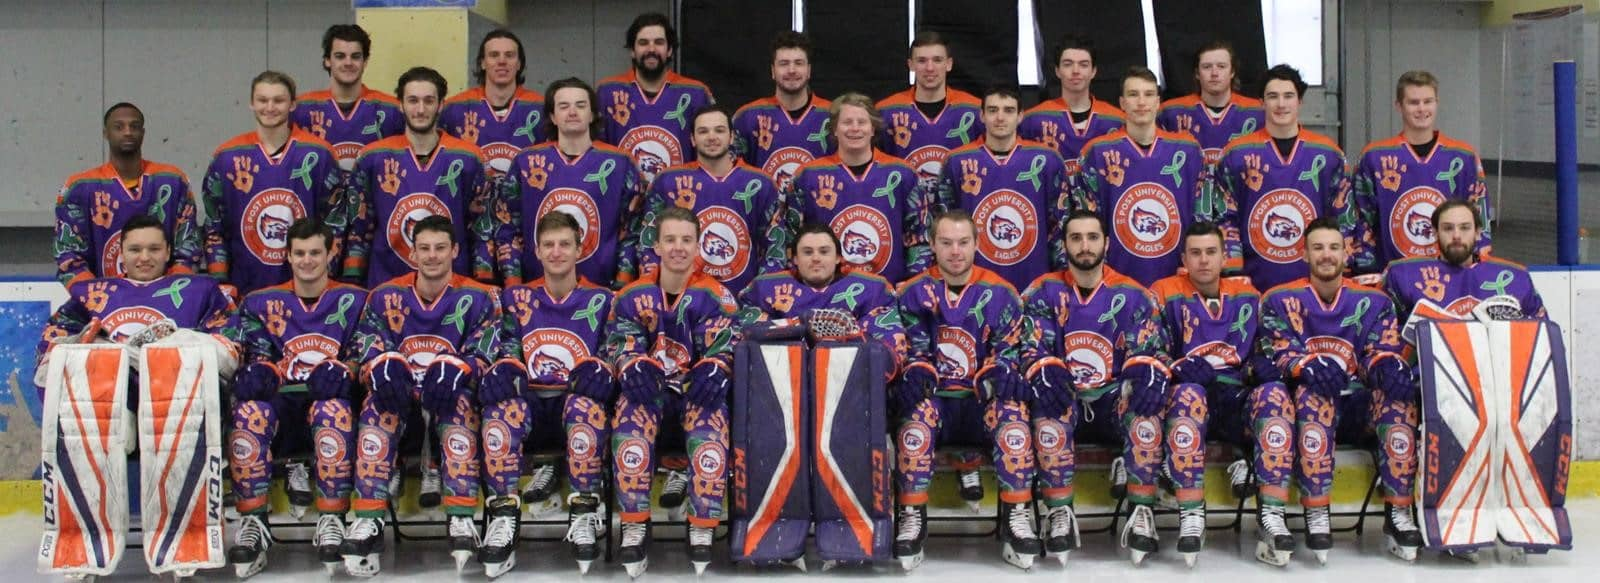 group photo of men's hockey team